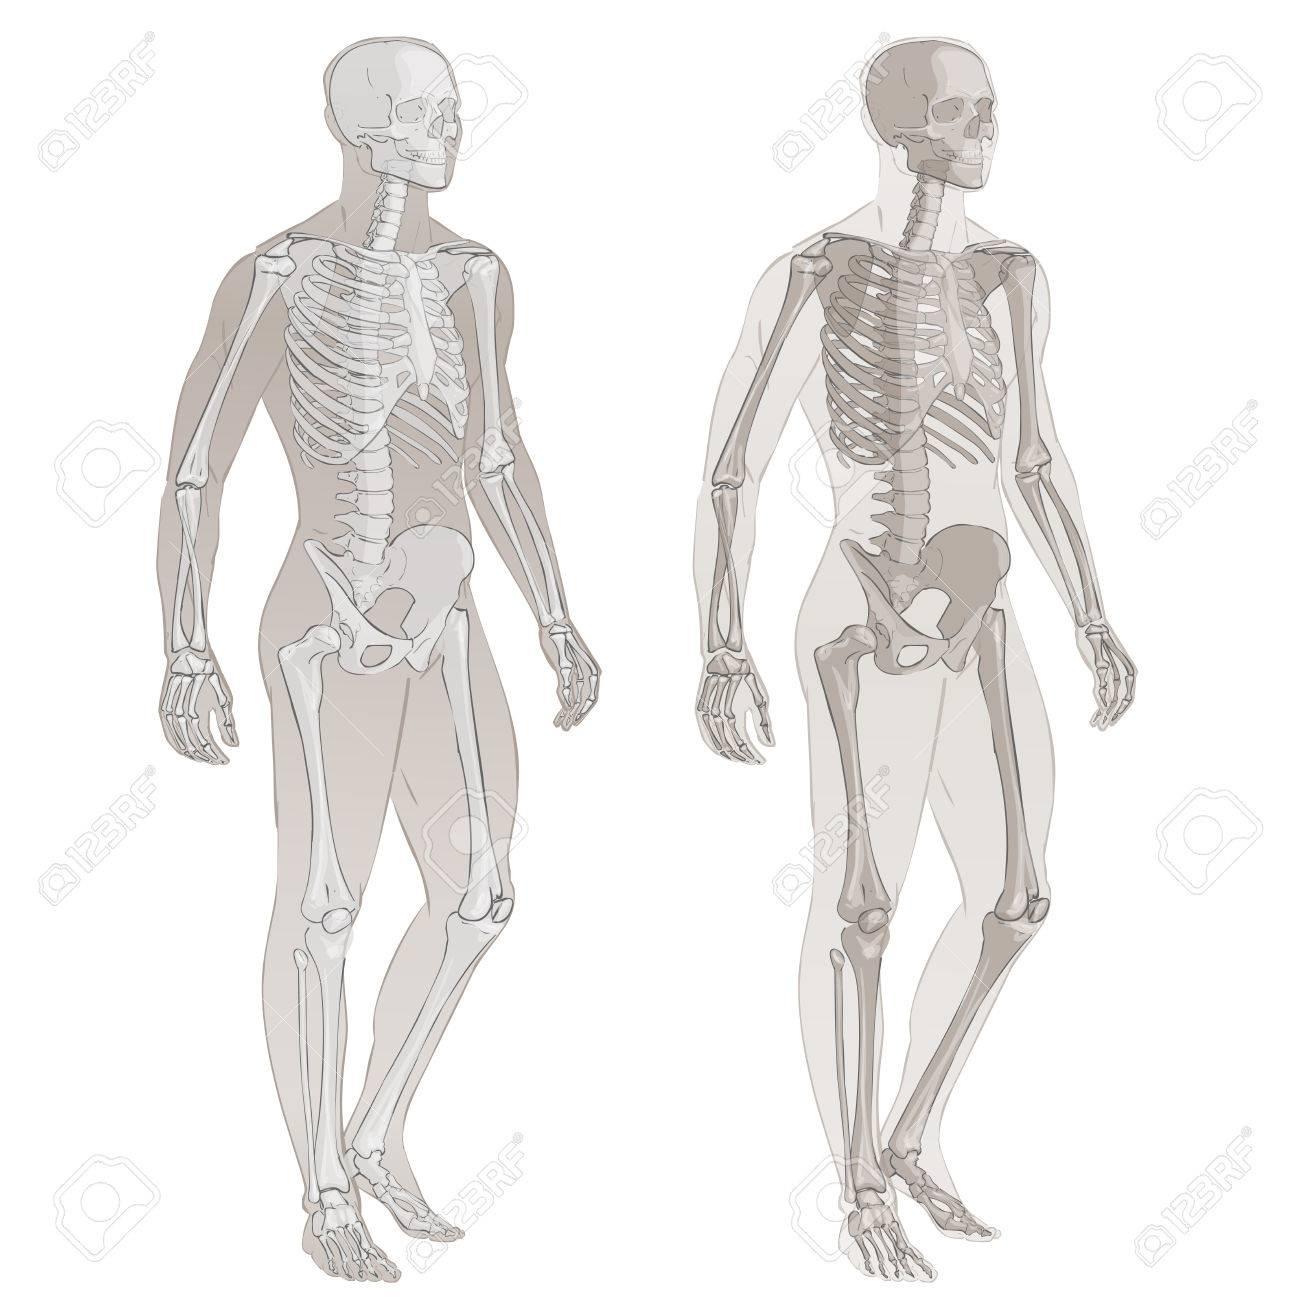 Human Body Parts Skeletal Man Anatomy Vector Illustration Isolated